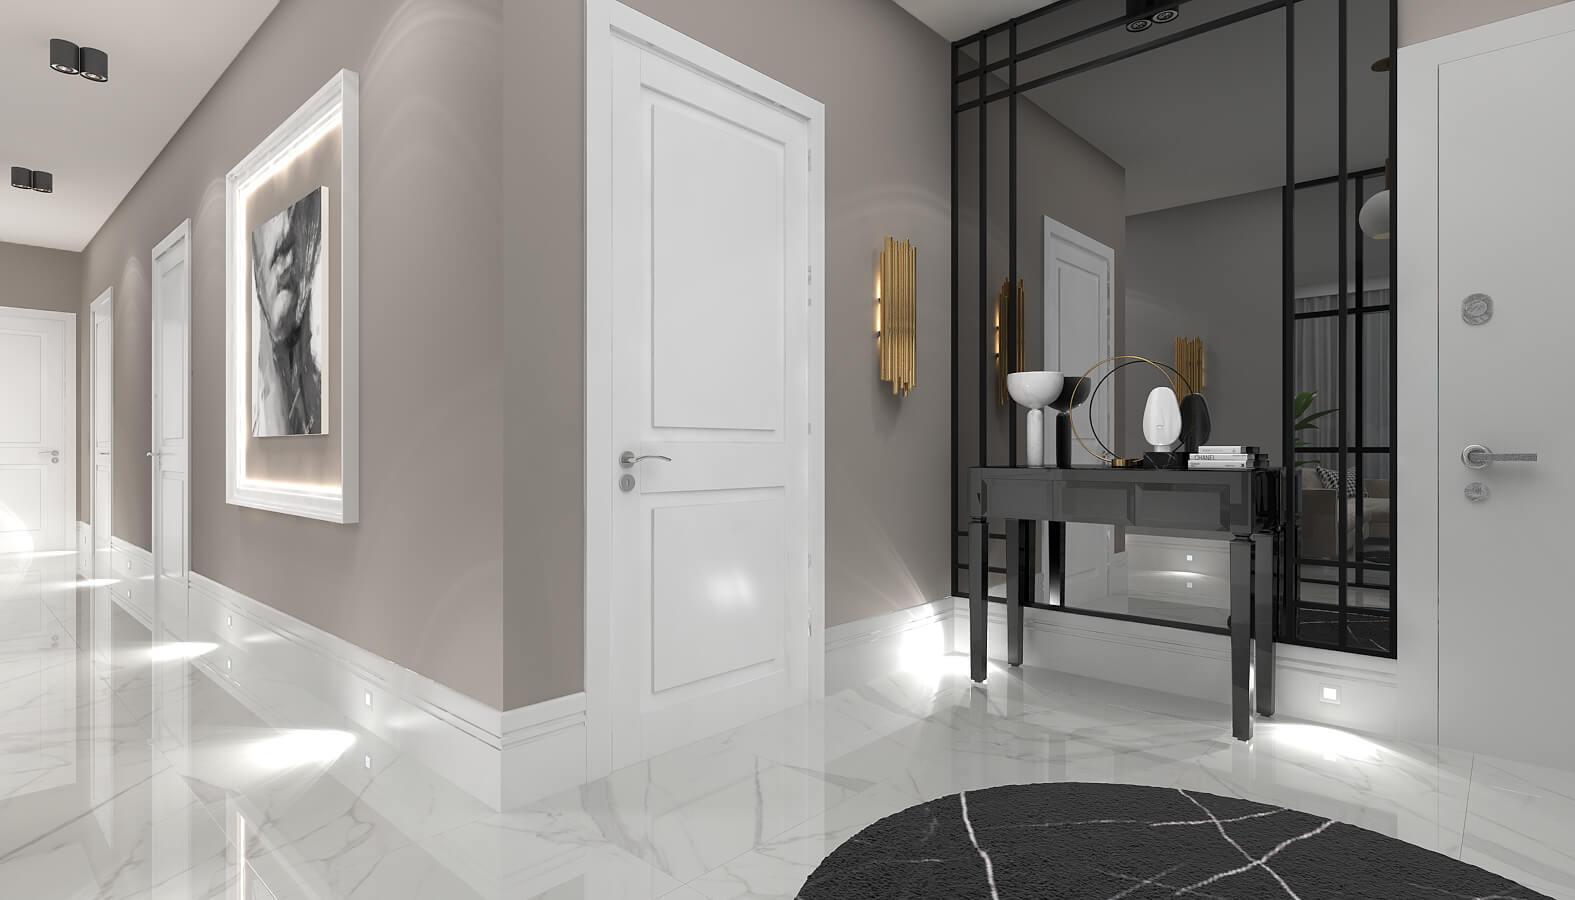 home inspiration 3540 BT Flat Residential